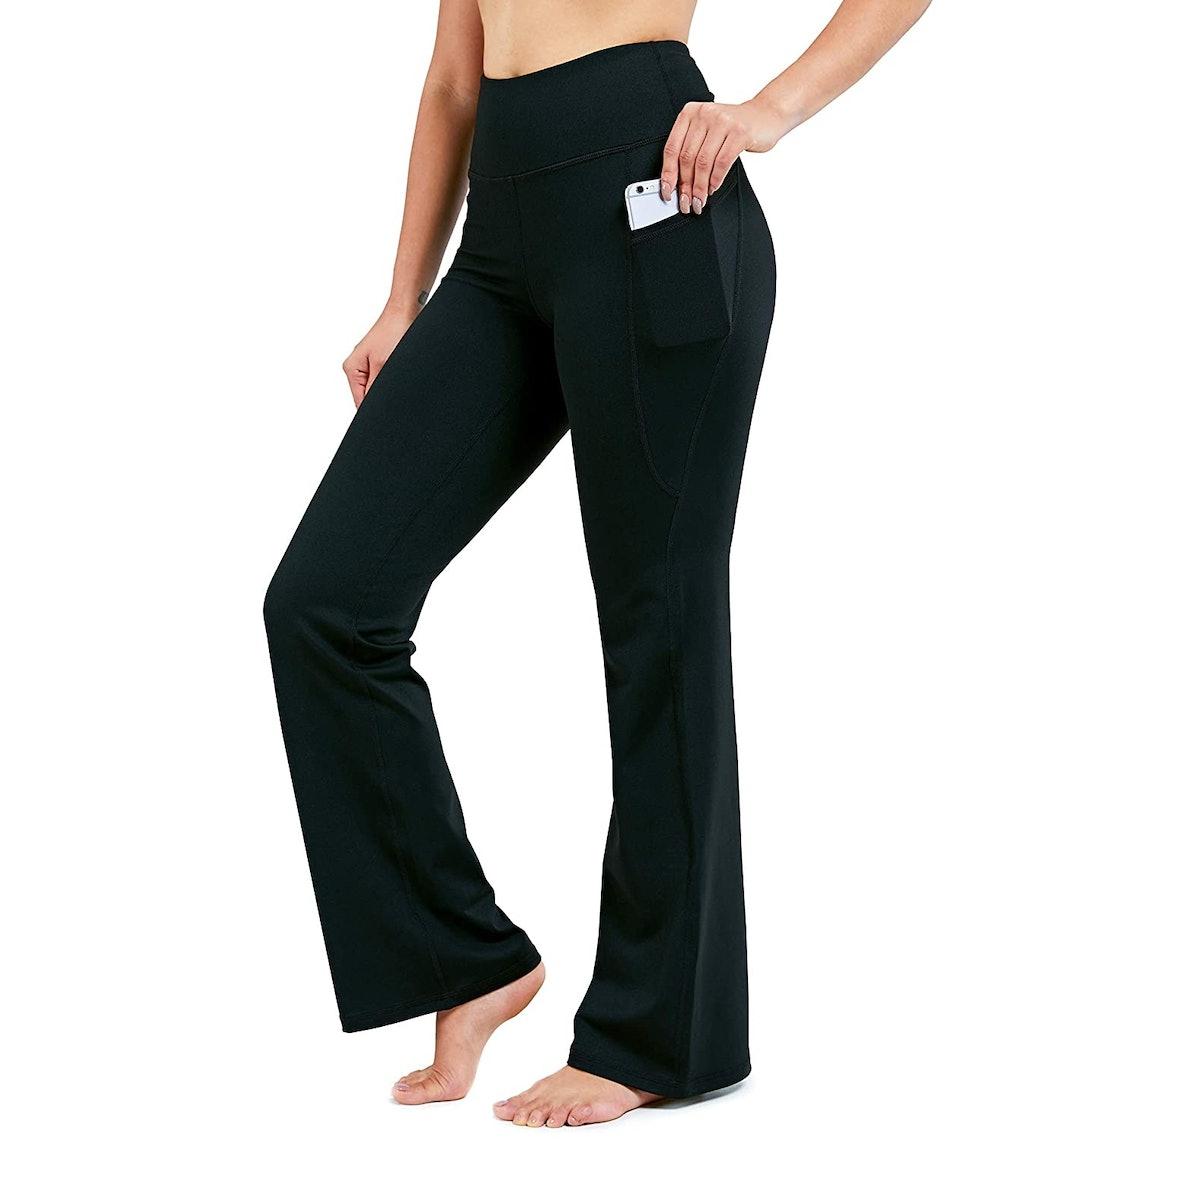 G Gradual Bootcut Yoga Pants